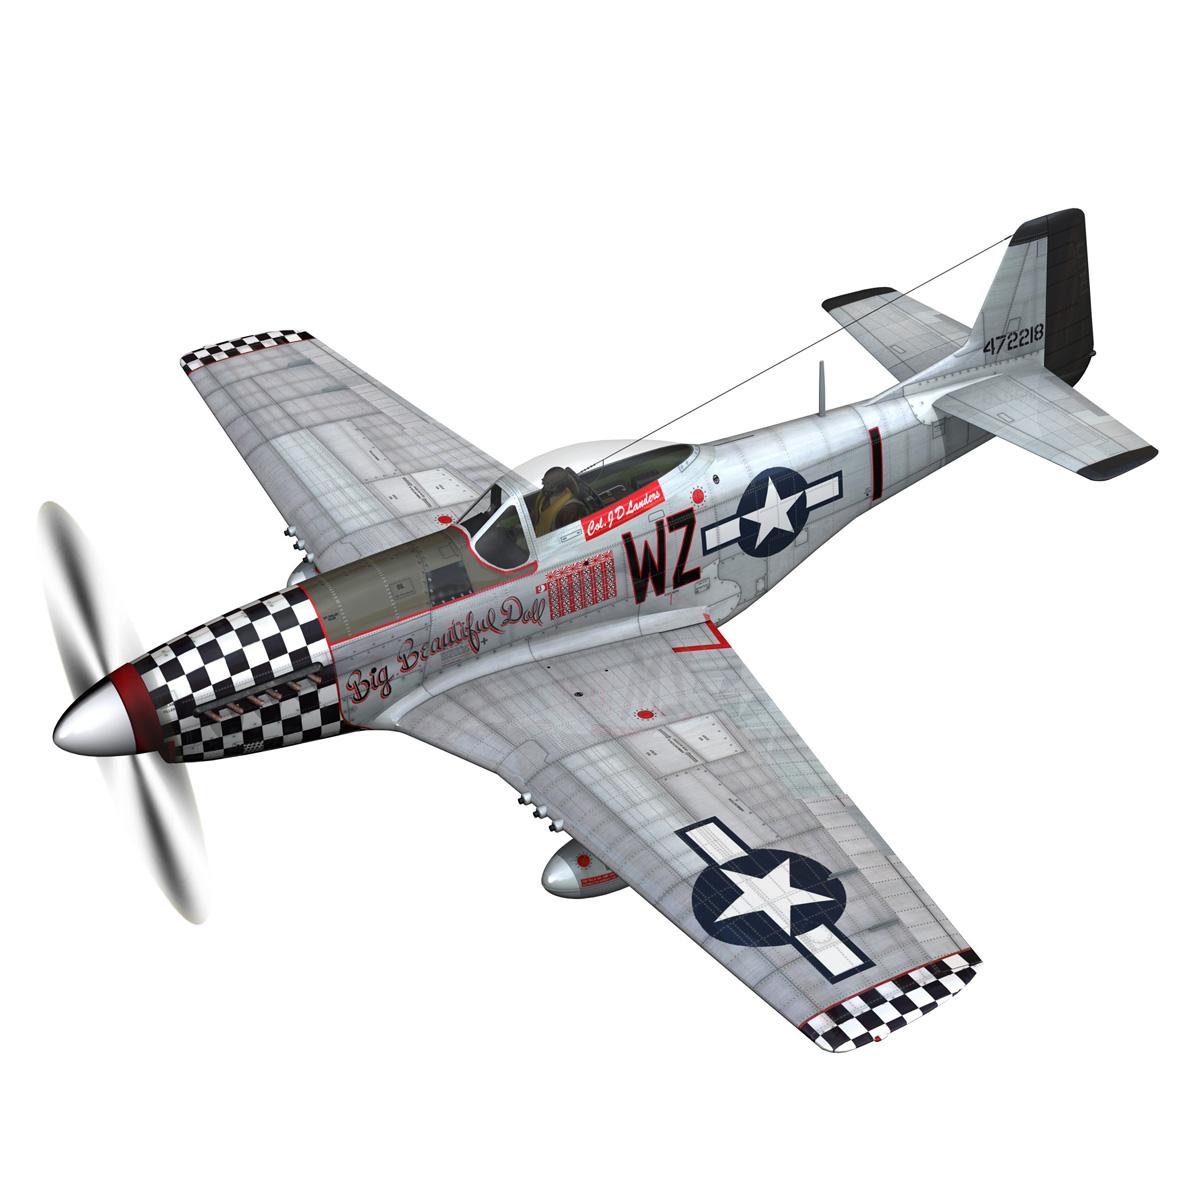 north american p-51d mustang – big beautiful doll 3d model fbx c4d lwo obj 282554